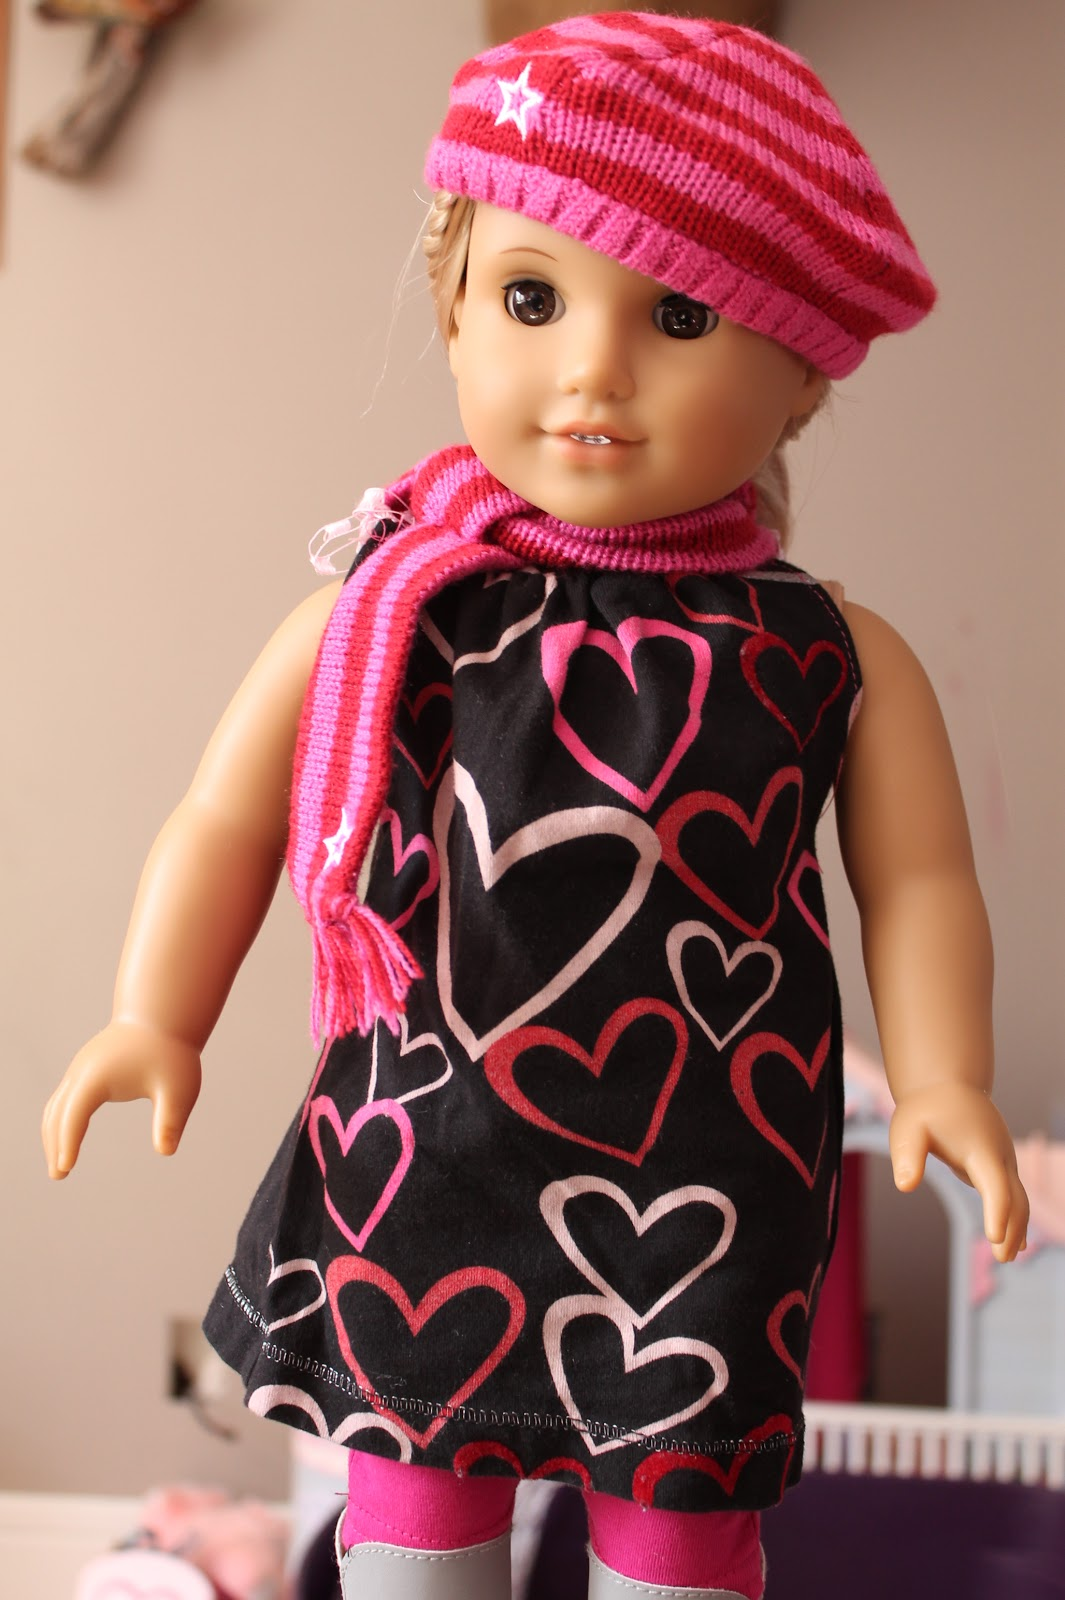 american girl doll play making valentine dresses for our dolls. Black Bedroom Furniture Sets. Home Design Ideas